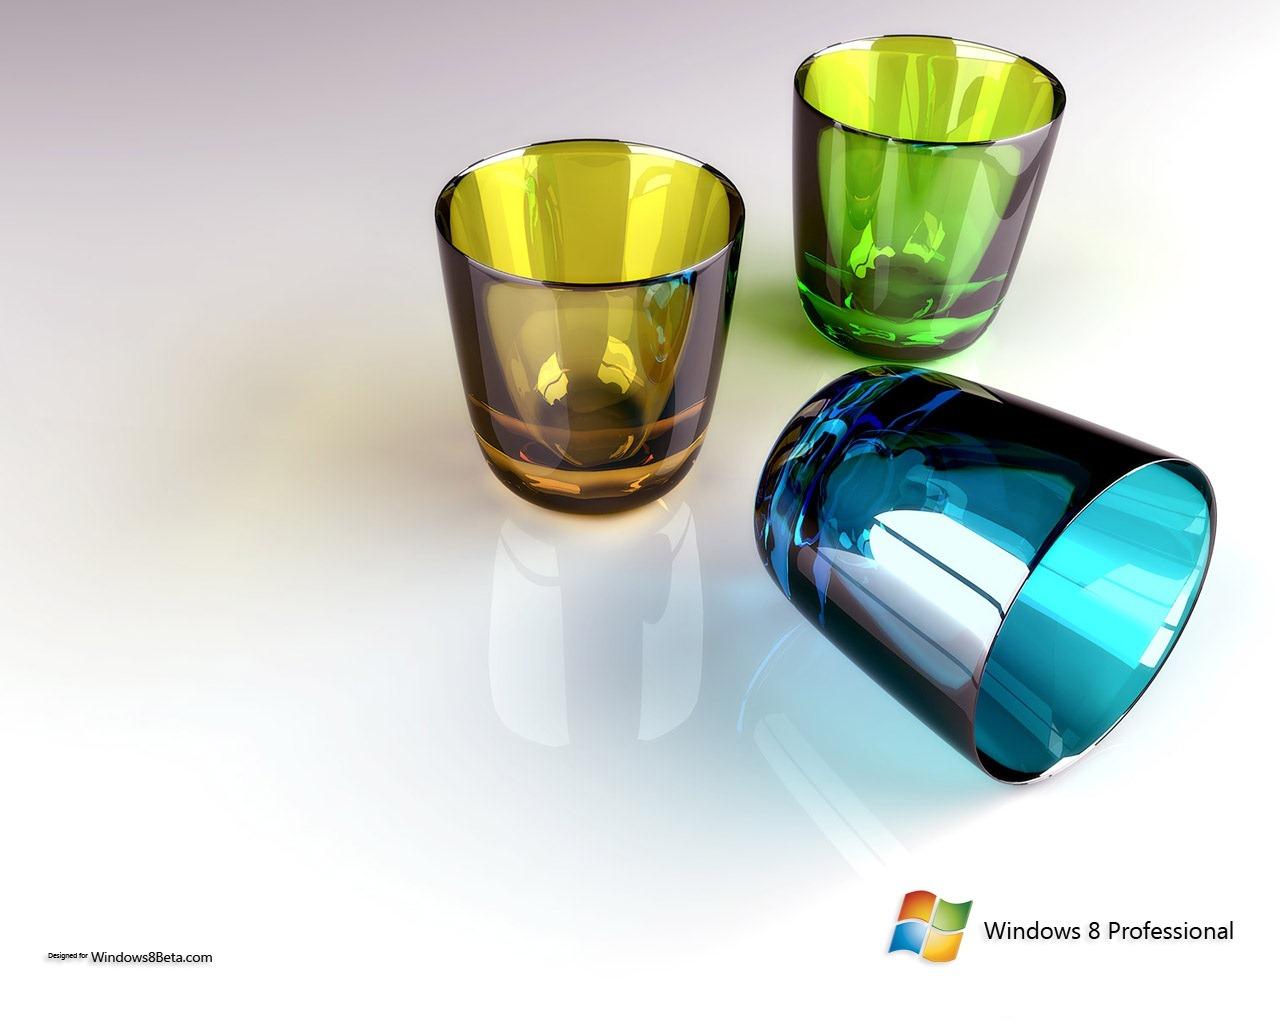 http://4.bp.blogspot.com/-2WlEZVfYsLM/TfG1KkCahmI/AAAAAAAACE8/8-4Y5MAGf-0/s1600/Windows-8-wallpapers_5.jpg